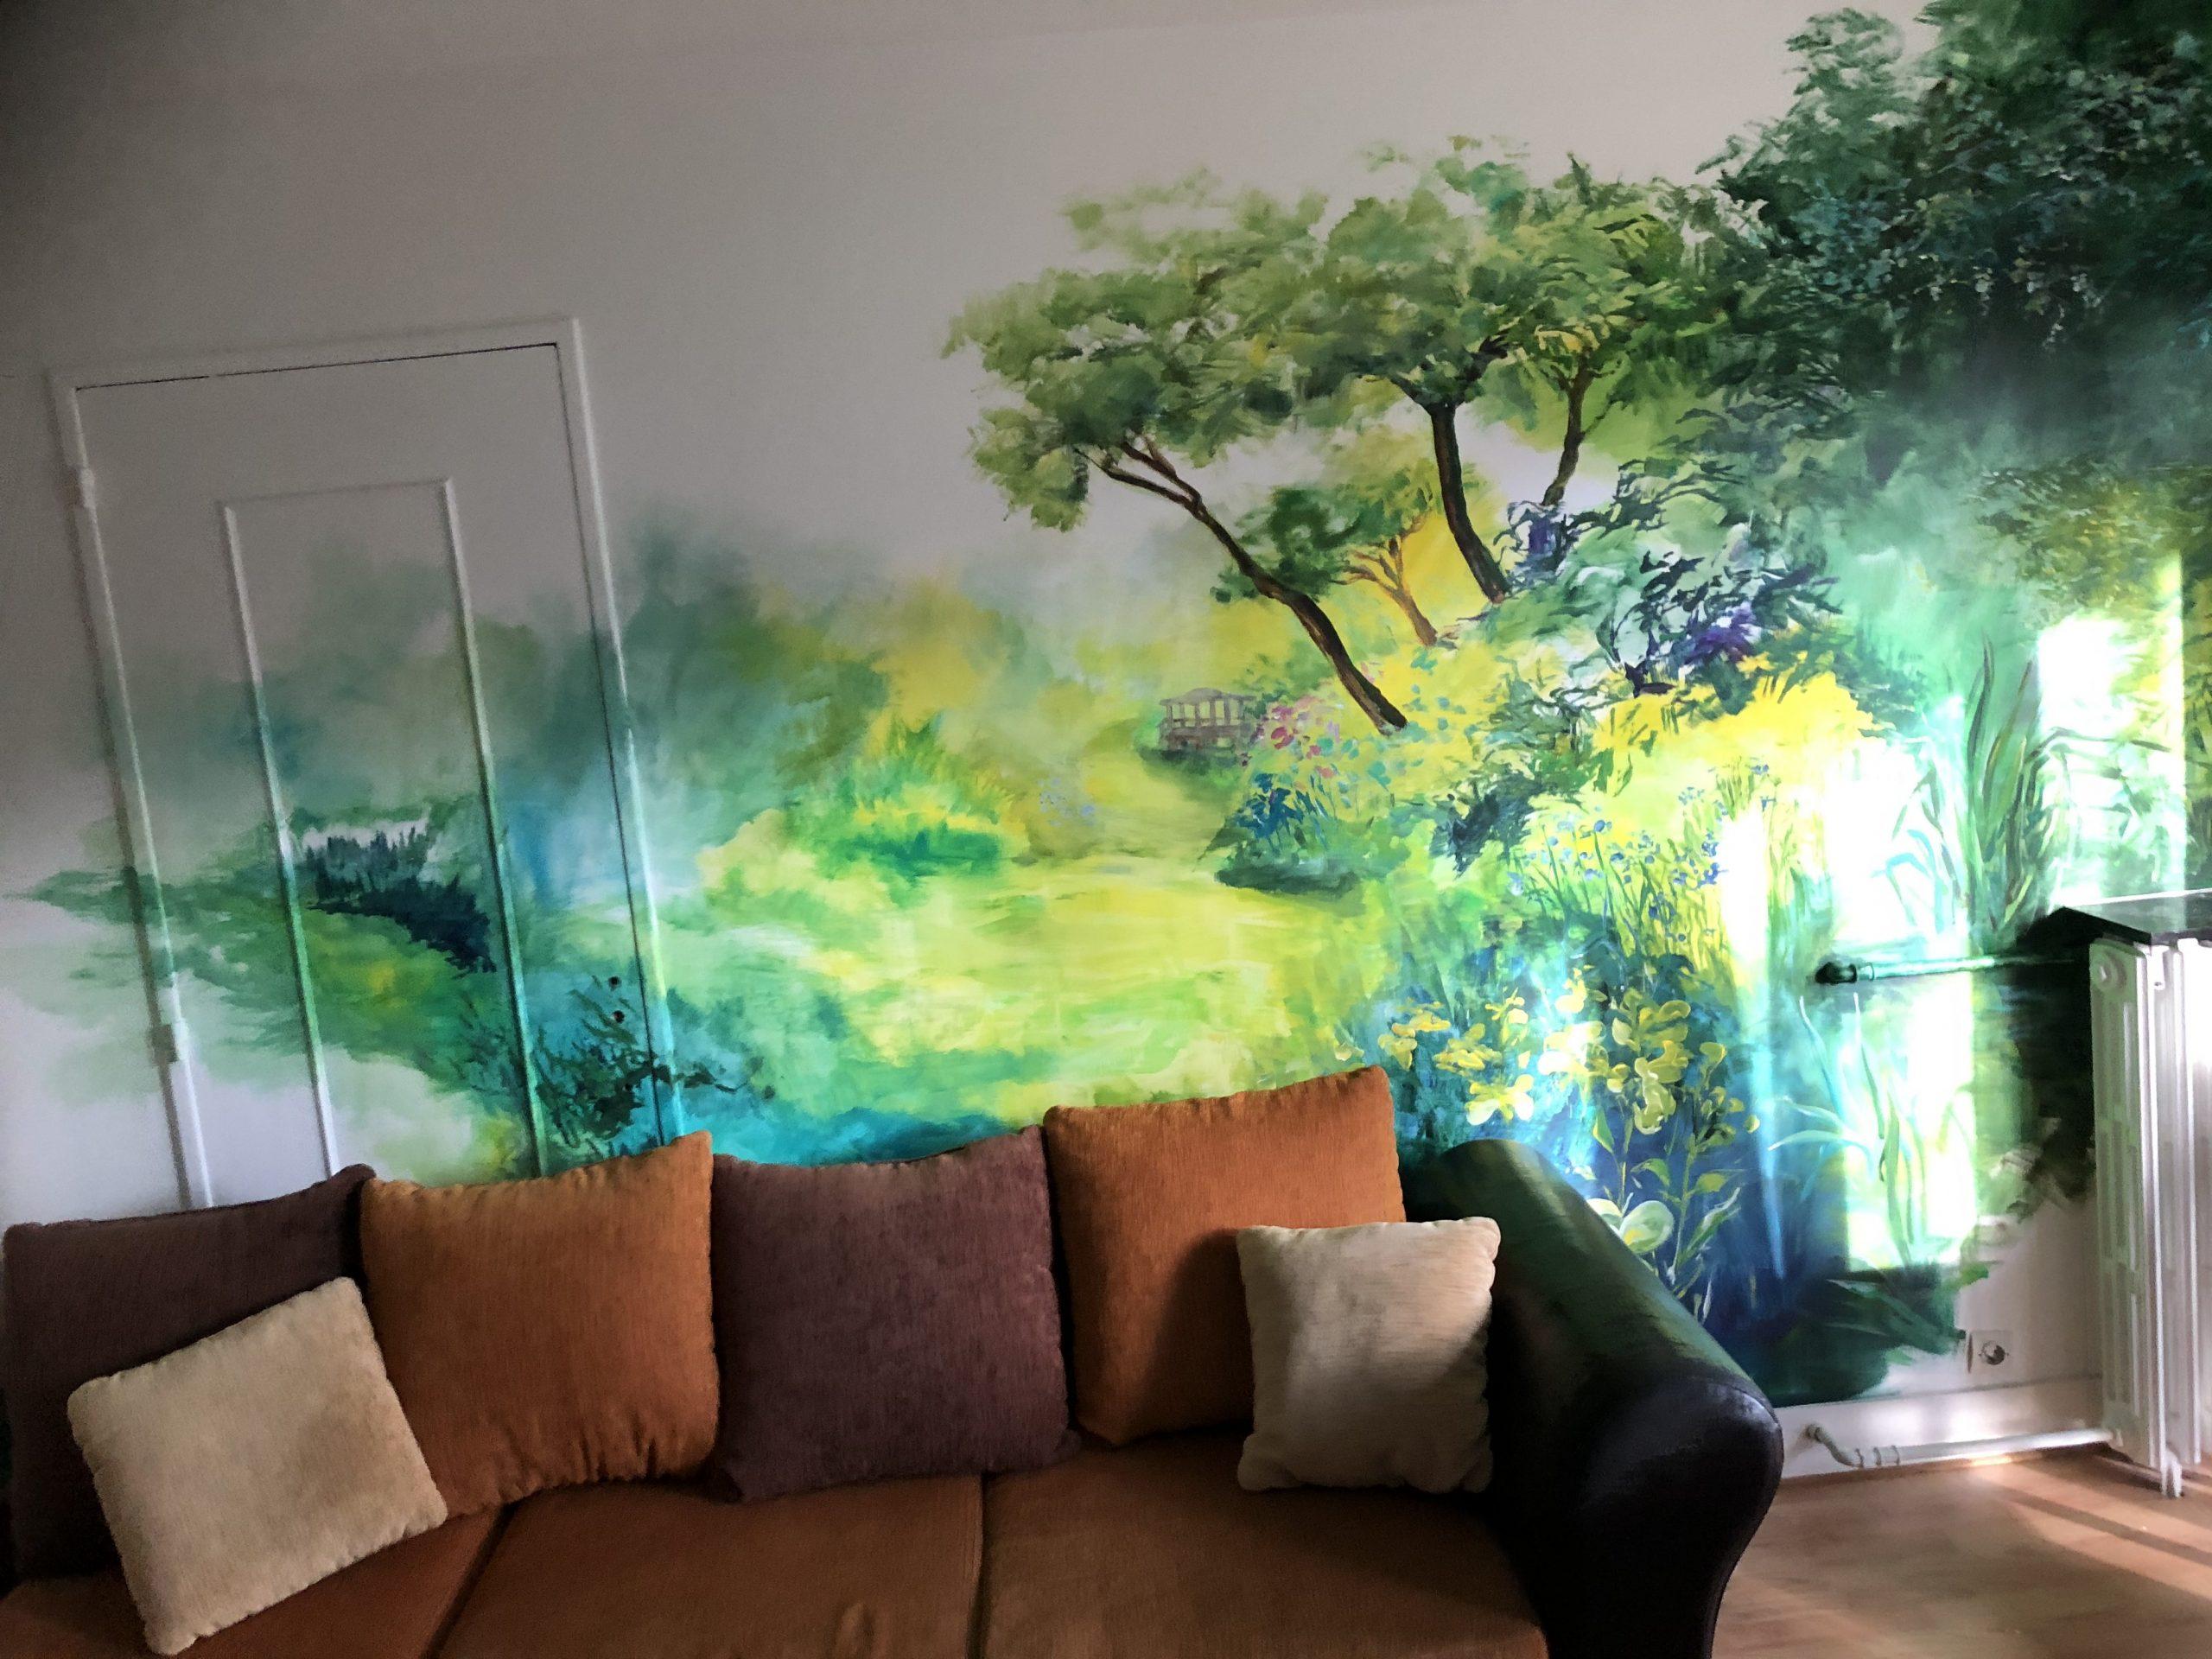 Le jardin anglais fresque murale artiste Christelle guénot